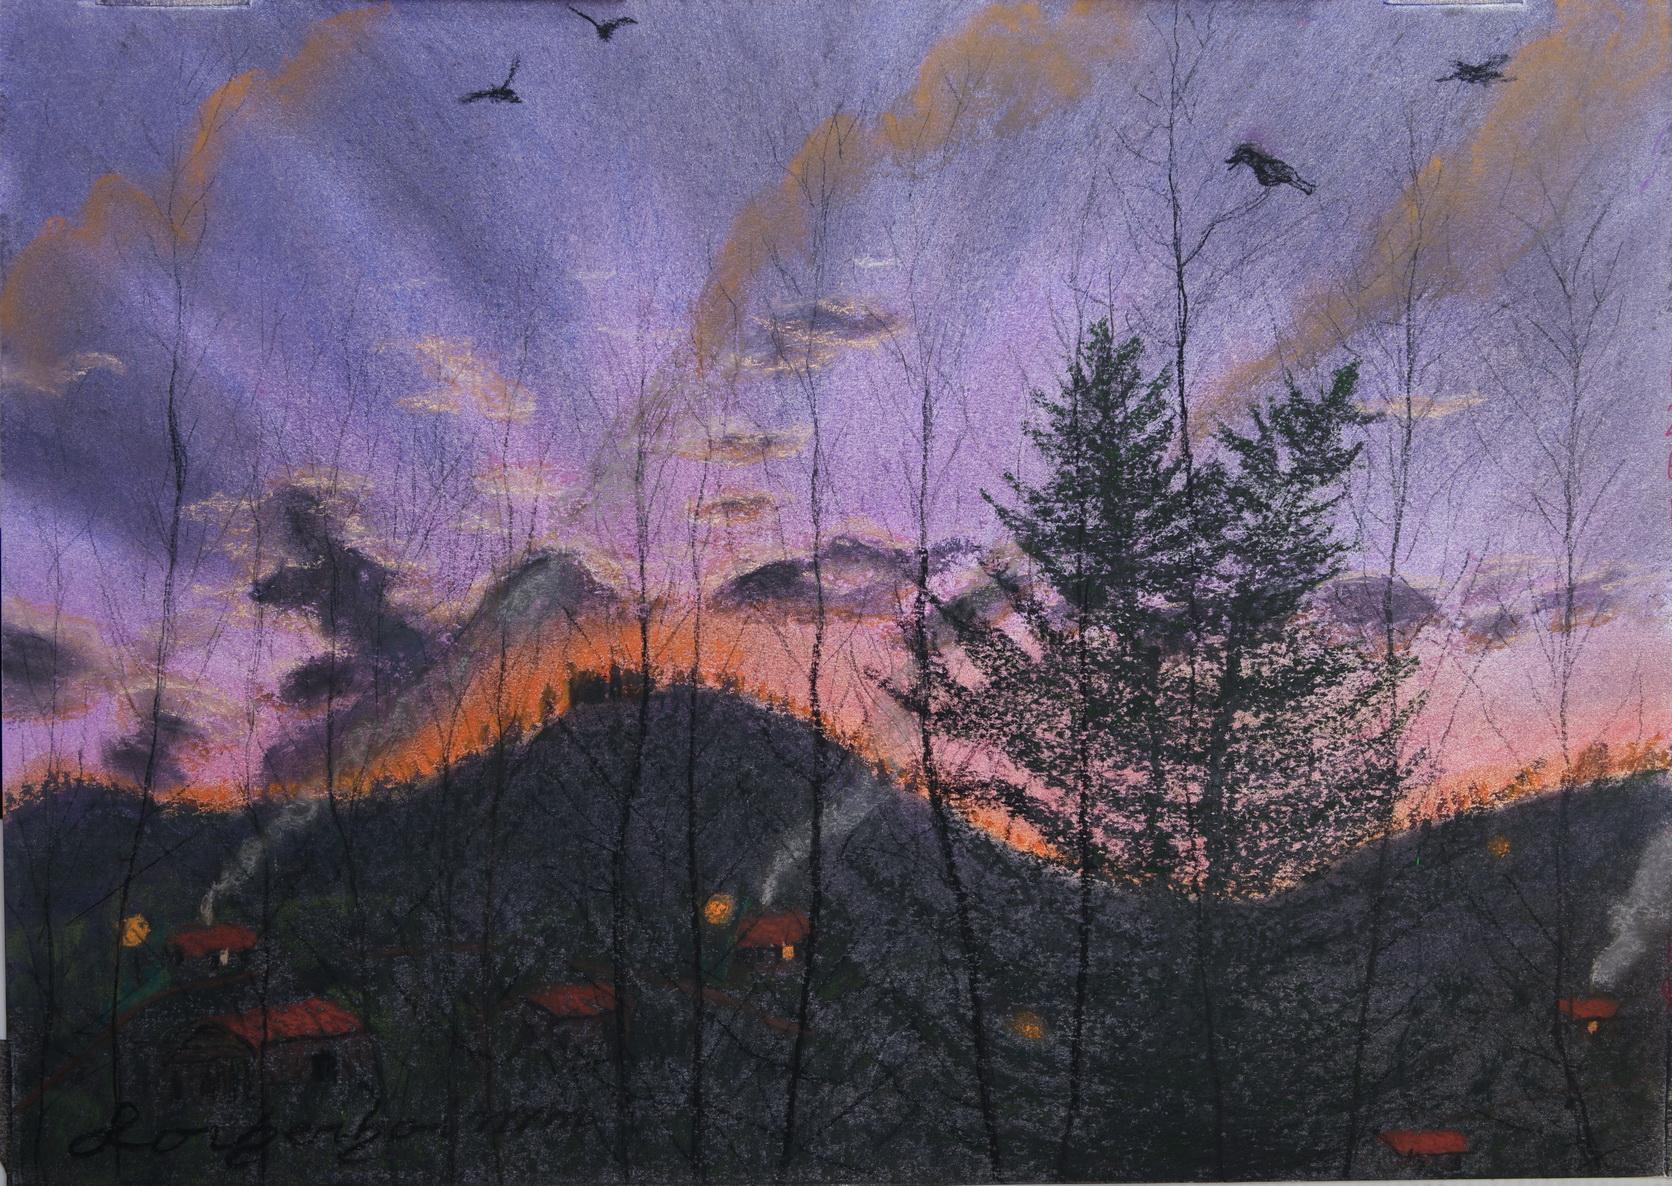 Metula sun rise. Lorberboim Soft Pastels Painting.